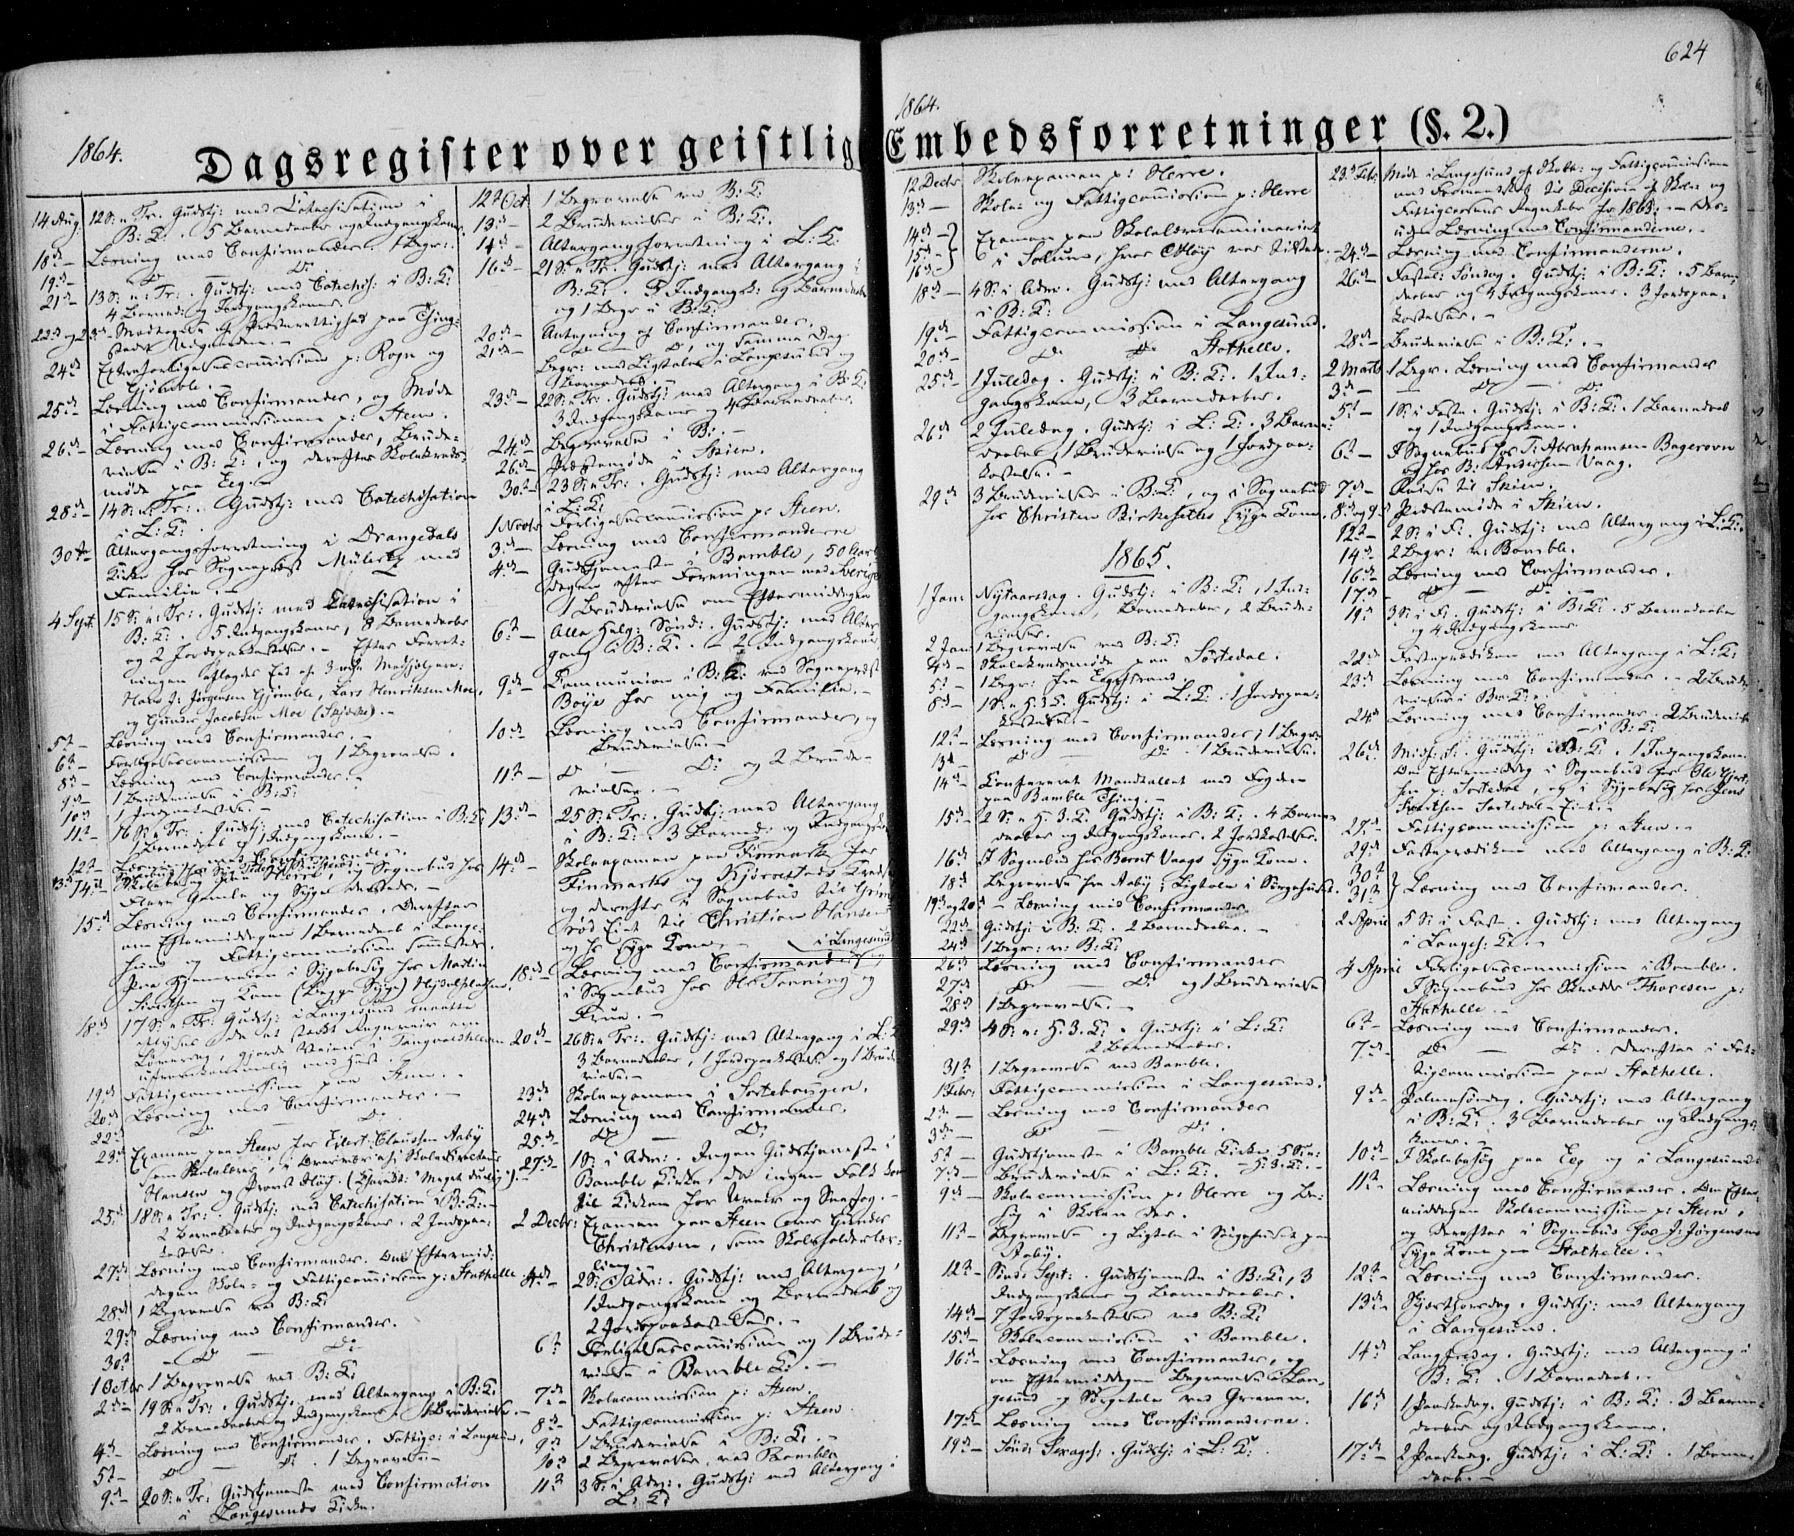 SAKO, Bamble kirkebøker, F/Fa/L0005: Ministerialbok nr. I 5, 1854-1869, s. 624